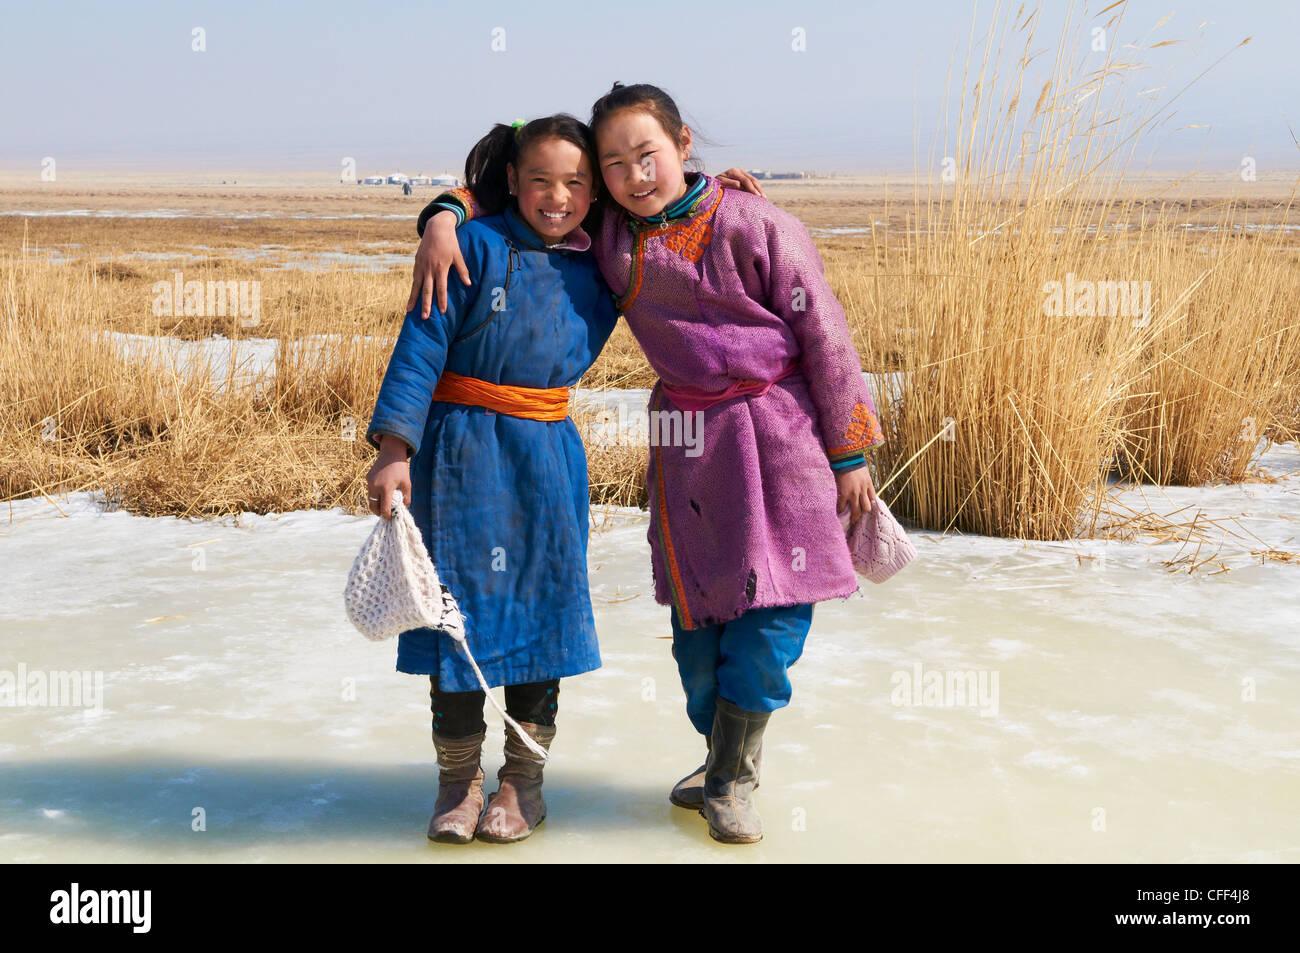 Mongolische Mädchen in traditioneller Tracht (Deel), Provinz Khovd, Mongolei, Zentral-Asien, Asien Stockbild